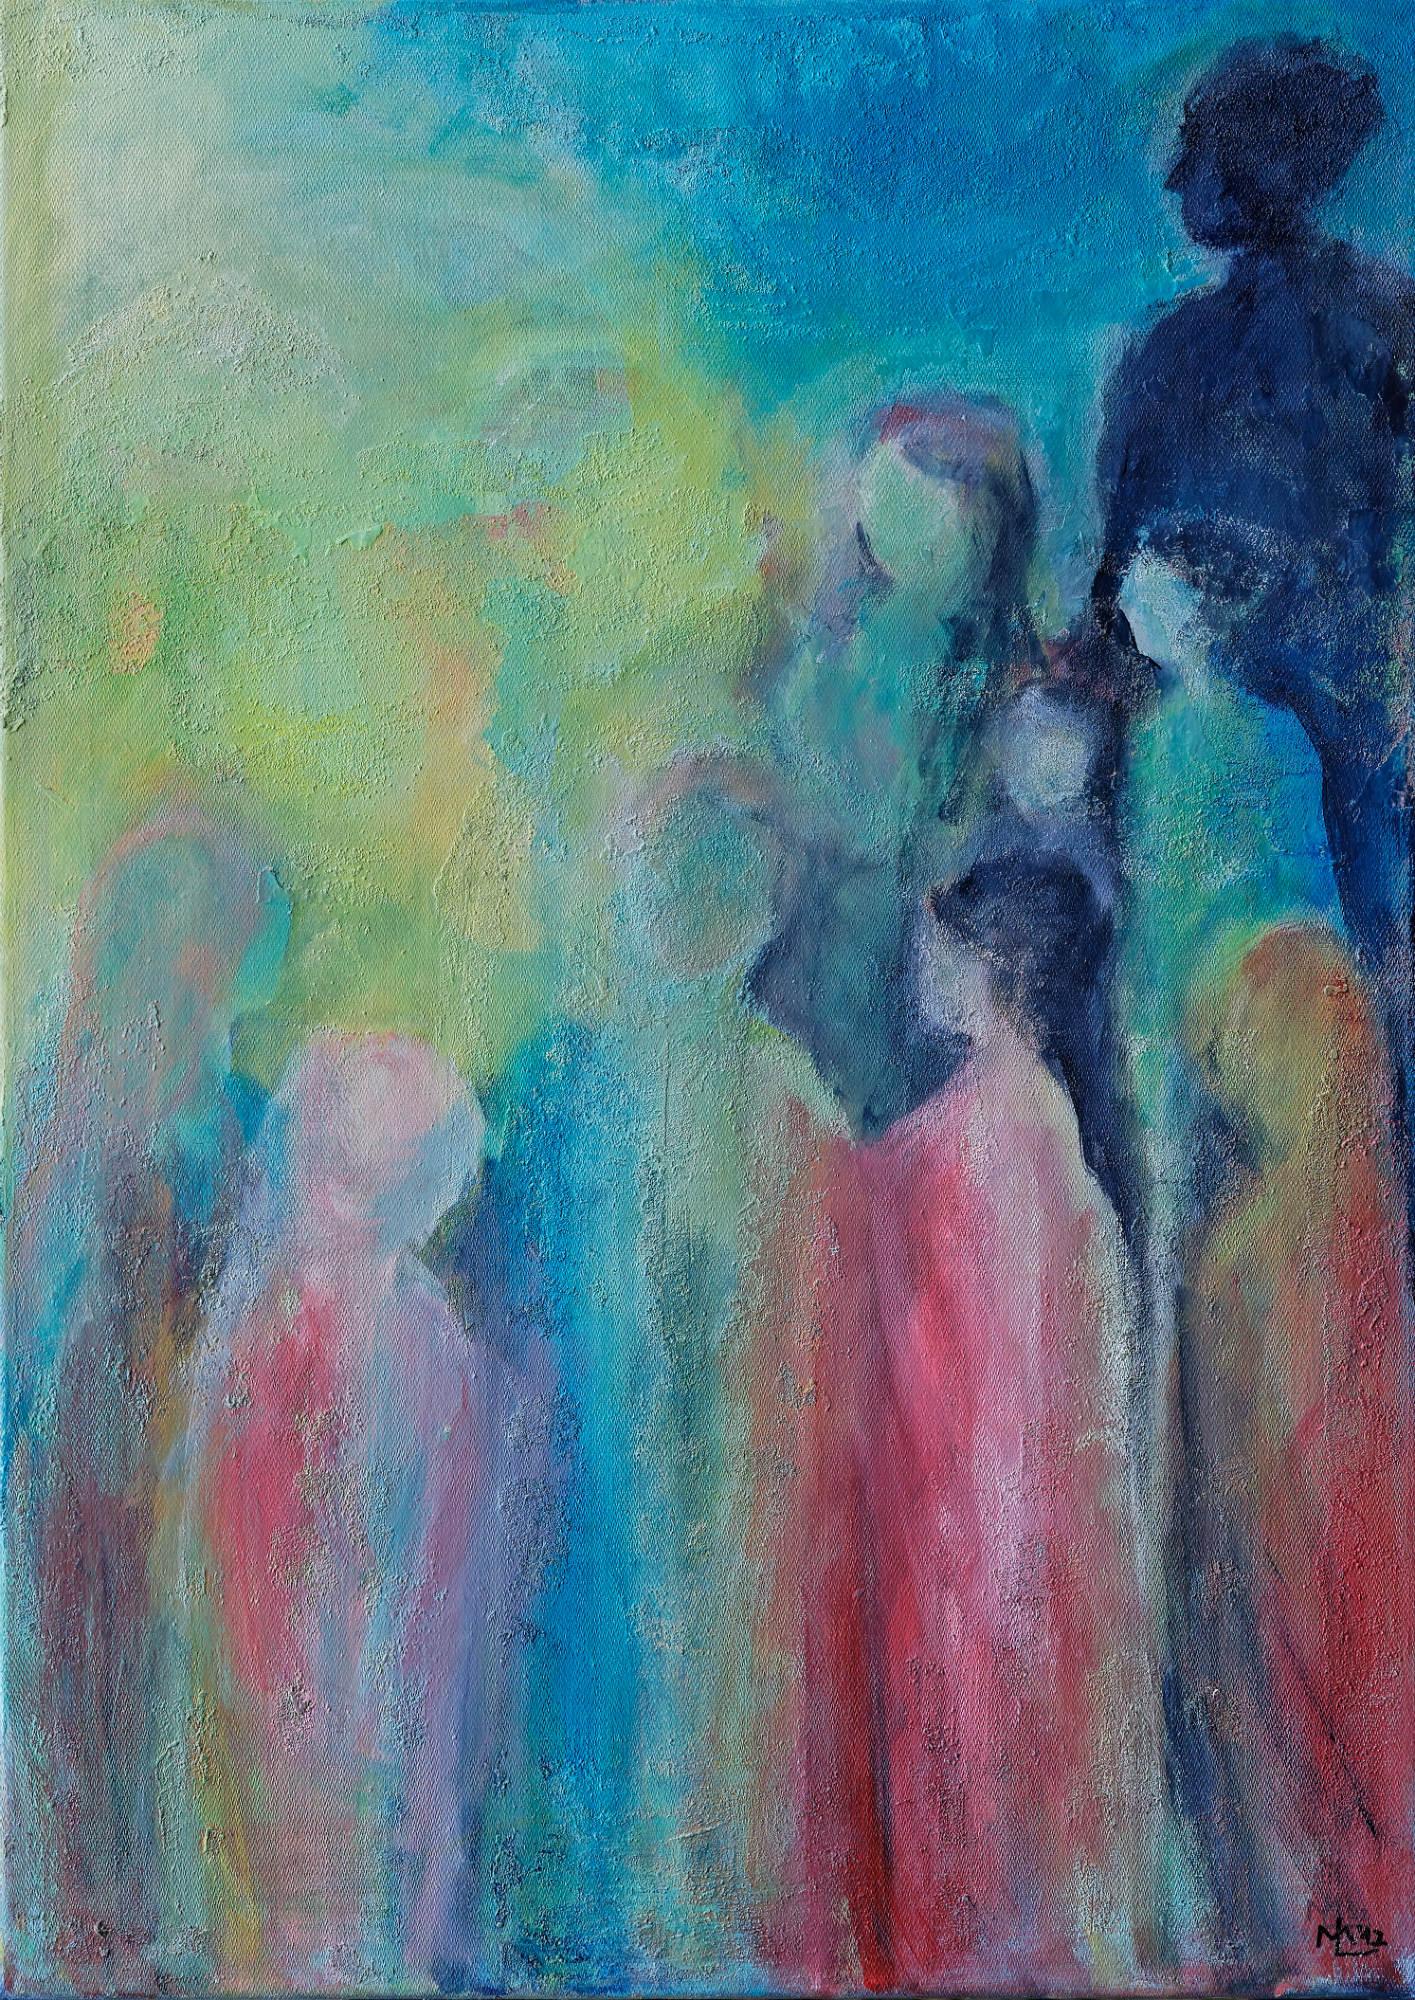 2015 - Licht, 50x70cm, Acryl-Spachteln